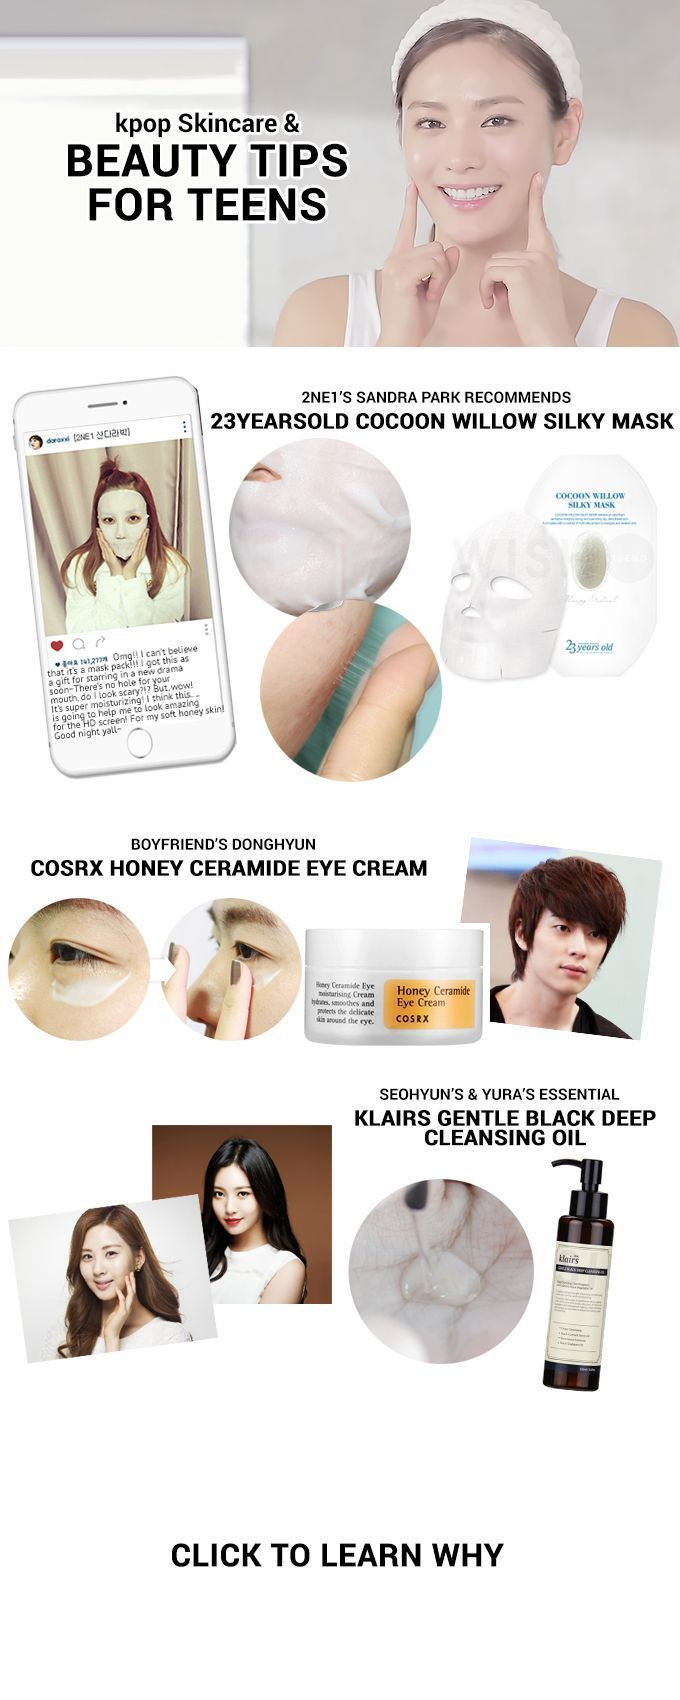 Womensskincarebeautysecrets Skincaretipsforblackheads Beauty Tips For Teens Skin Care Skin Care Essentials